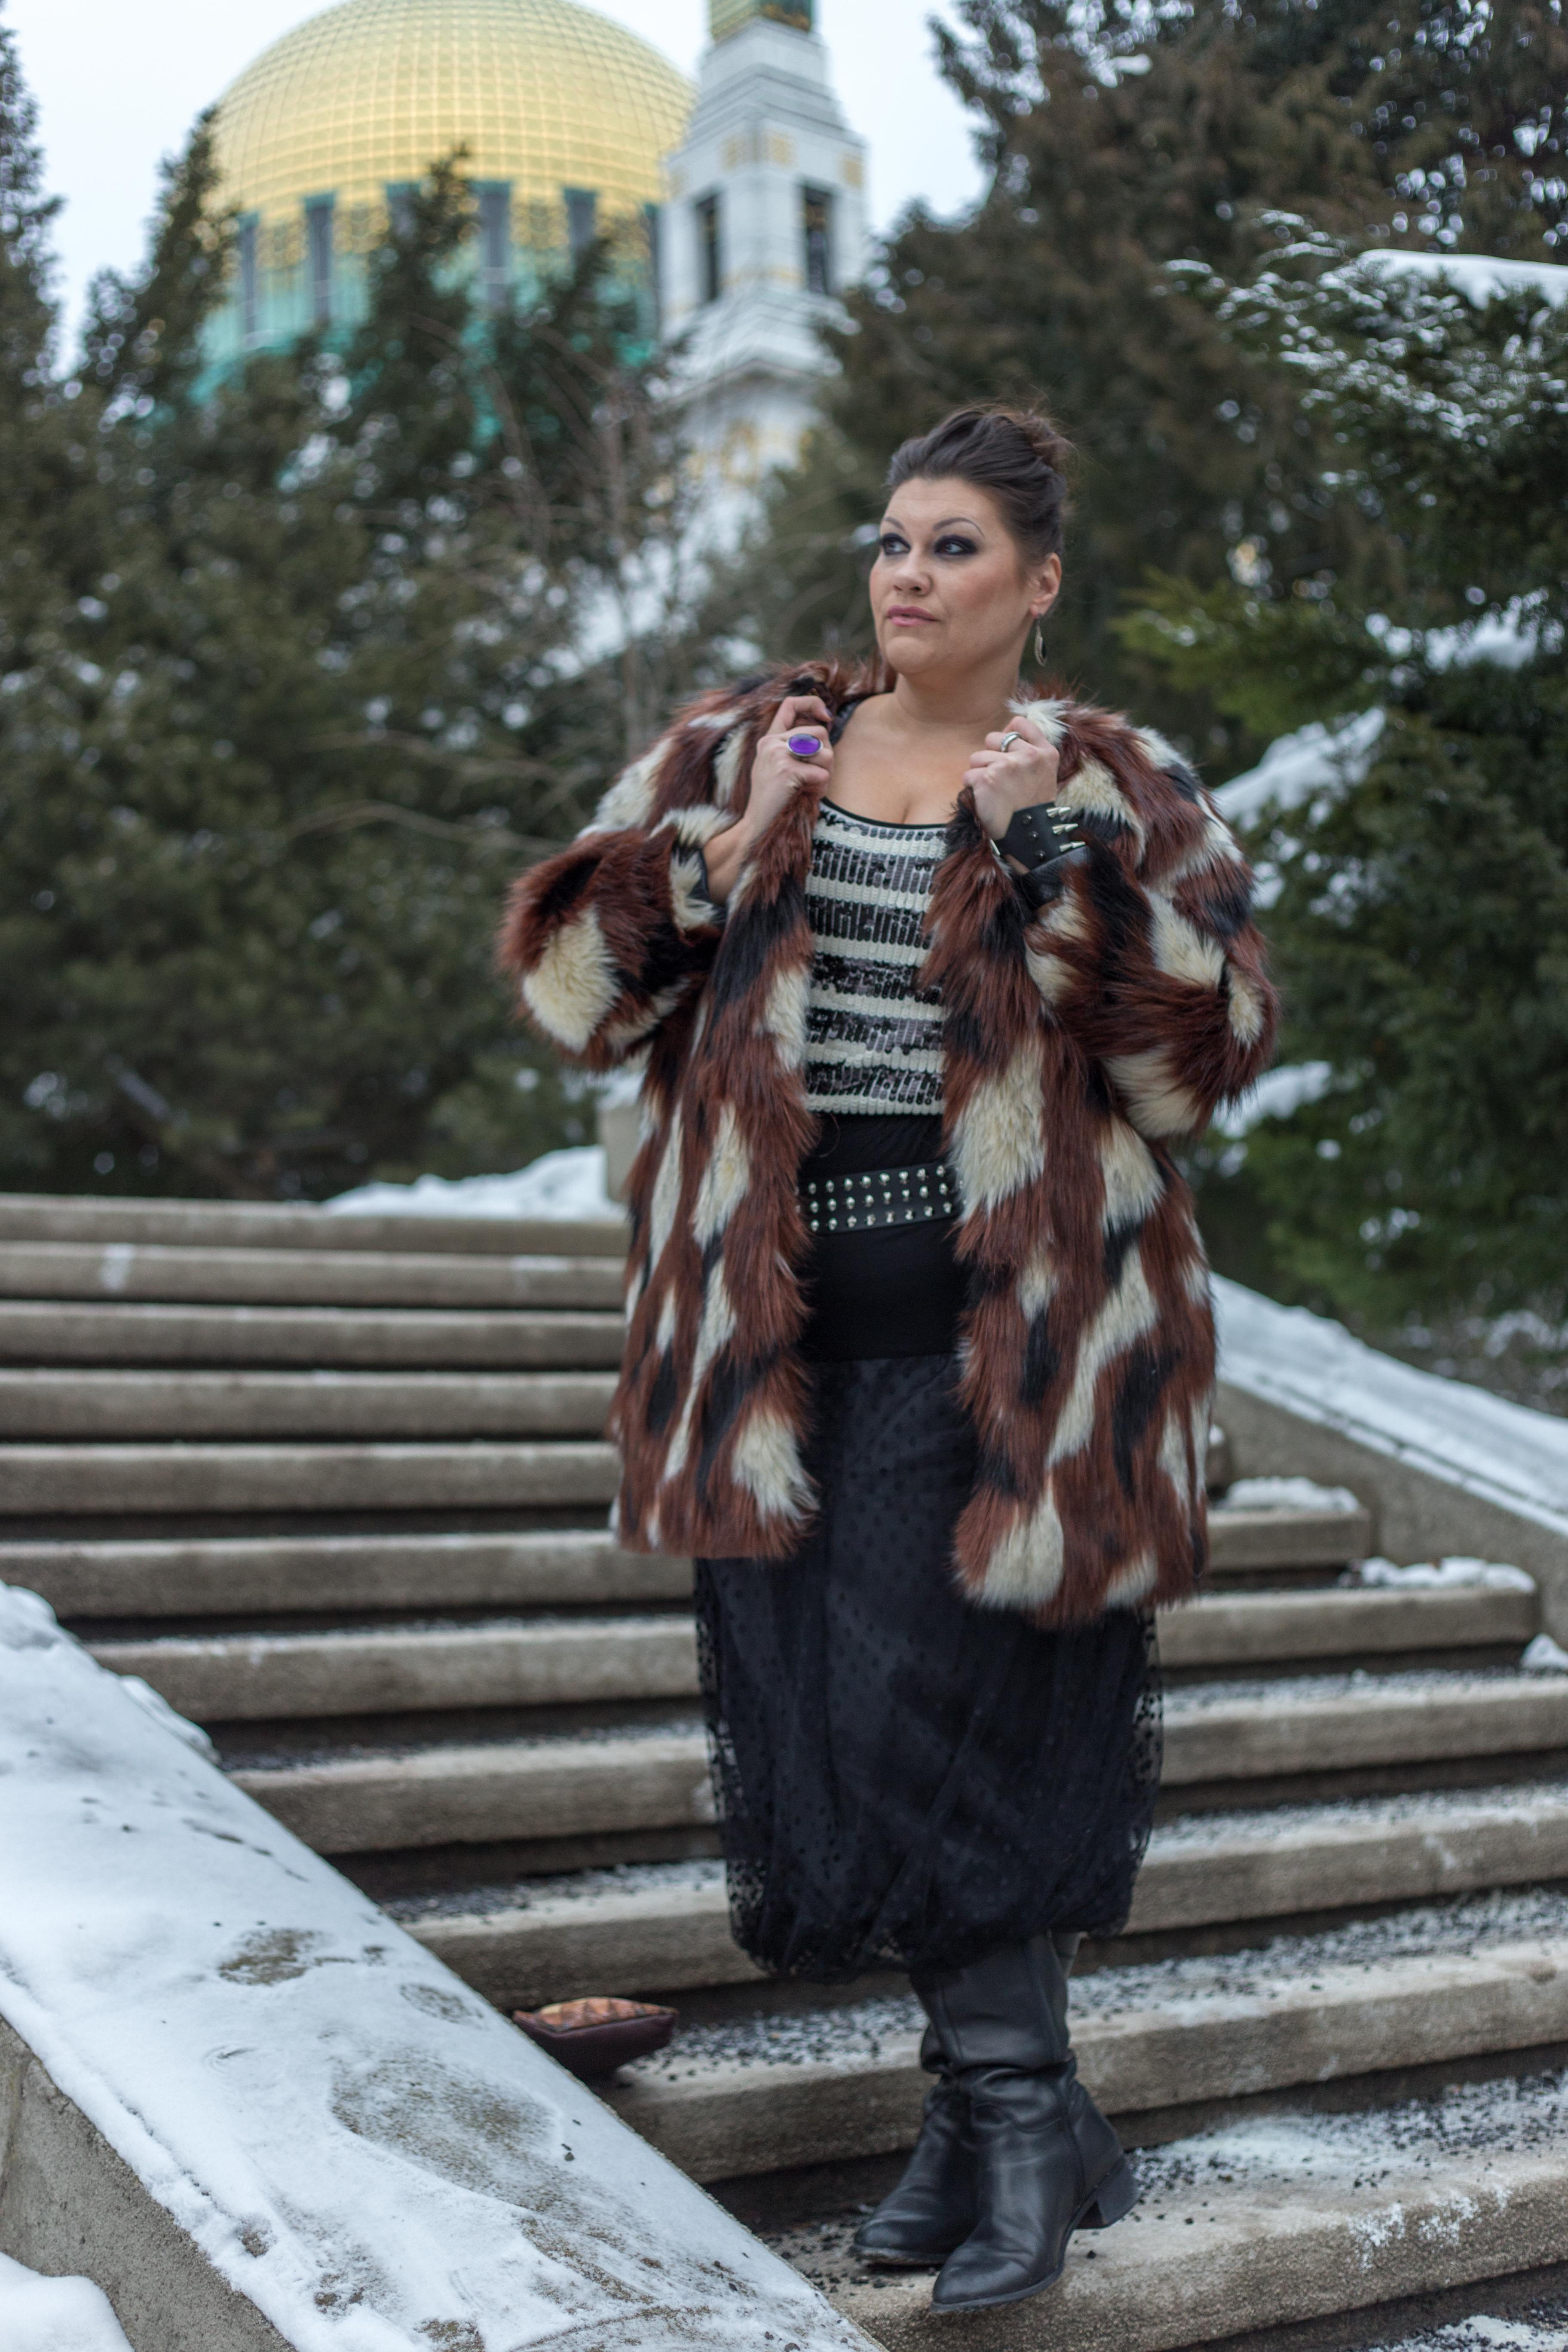 madonna blogger award navabi fauxfur plussize fashion devil queen outfit look pelz fakefur snowwhite kardiaserena (3)